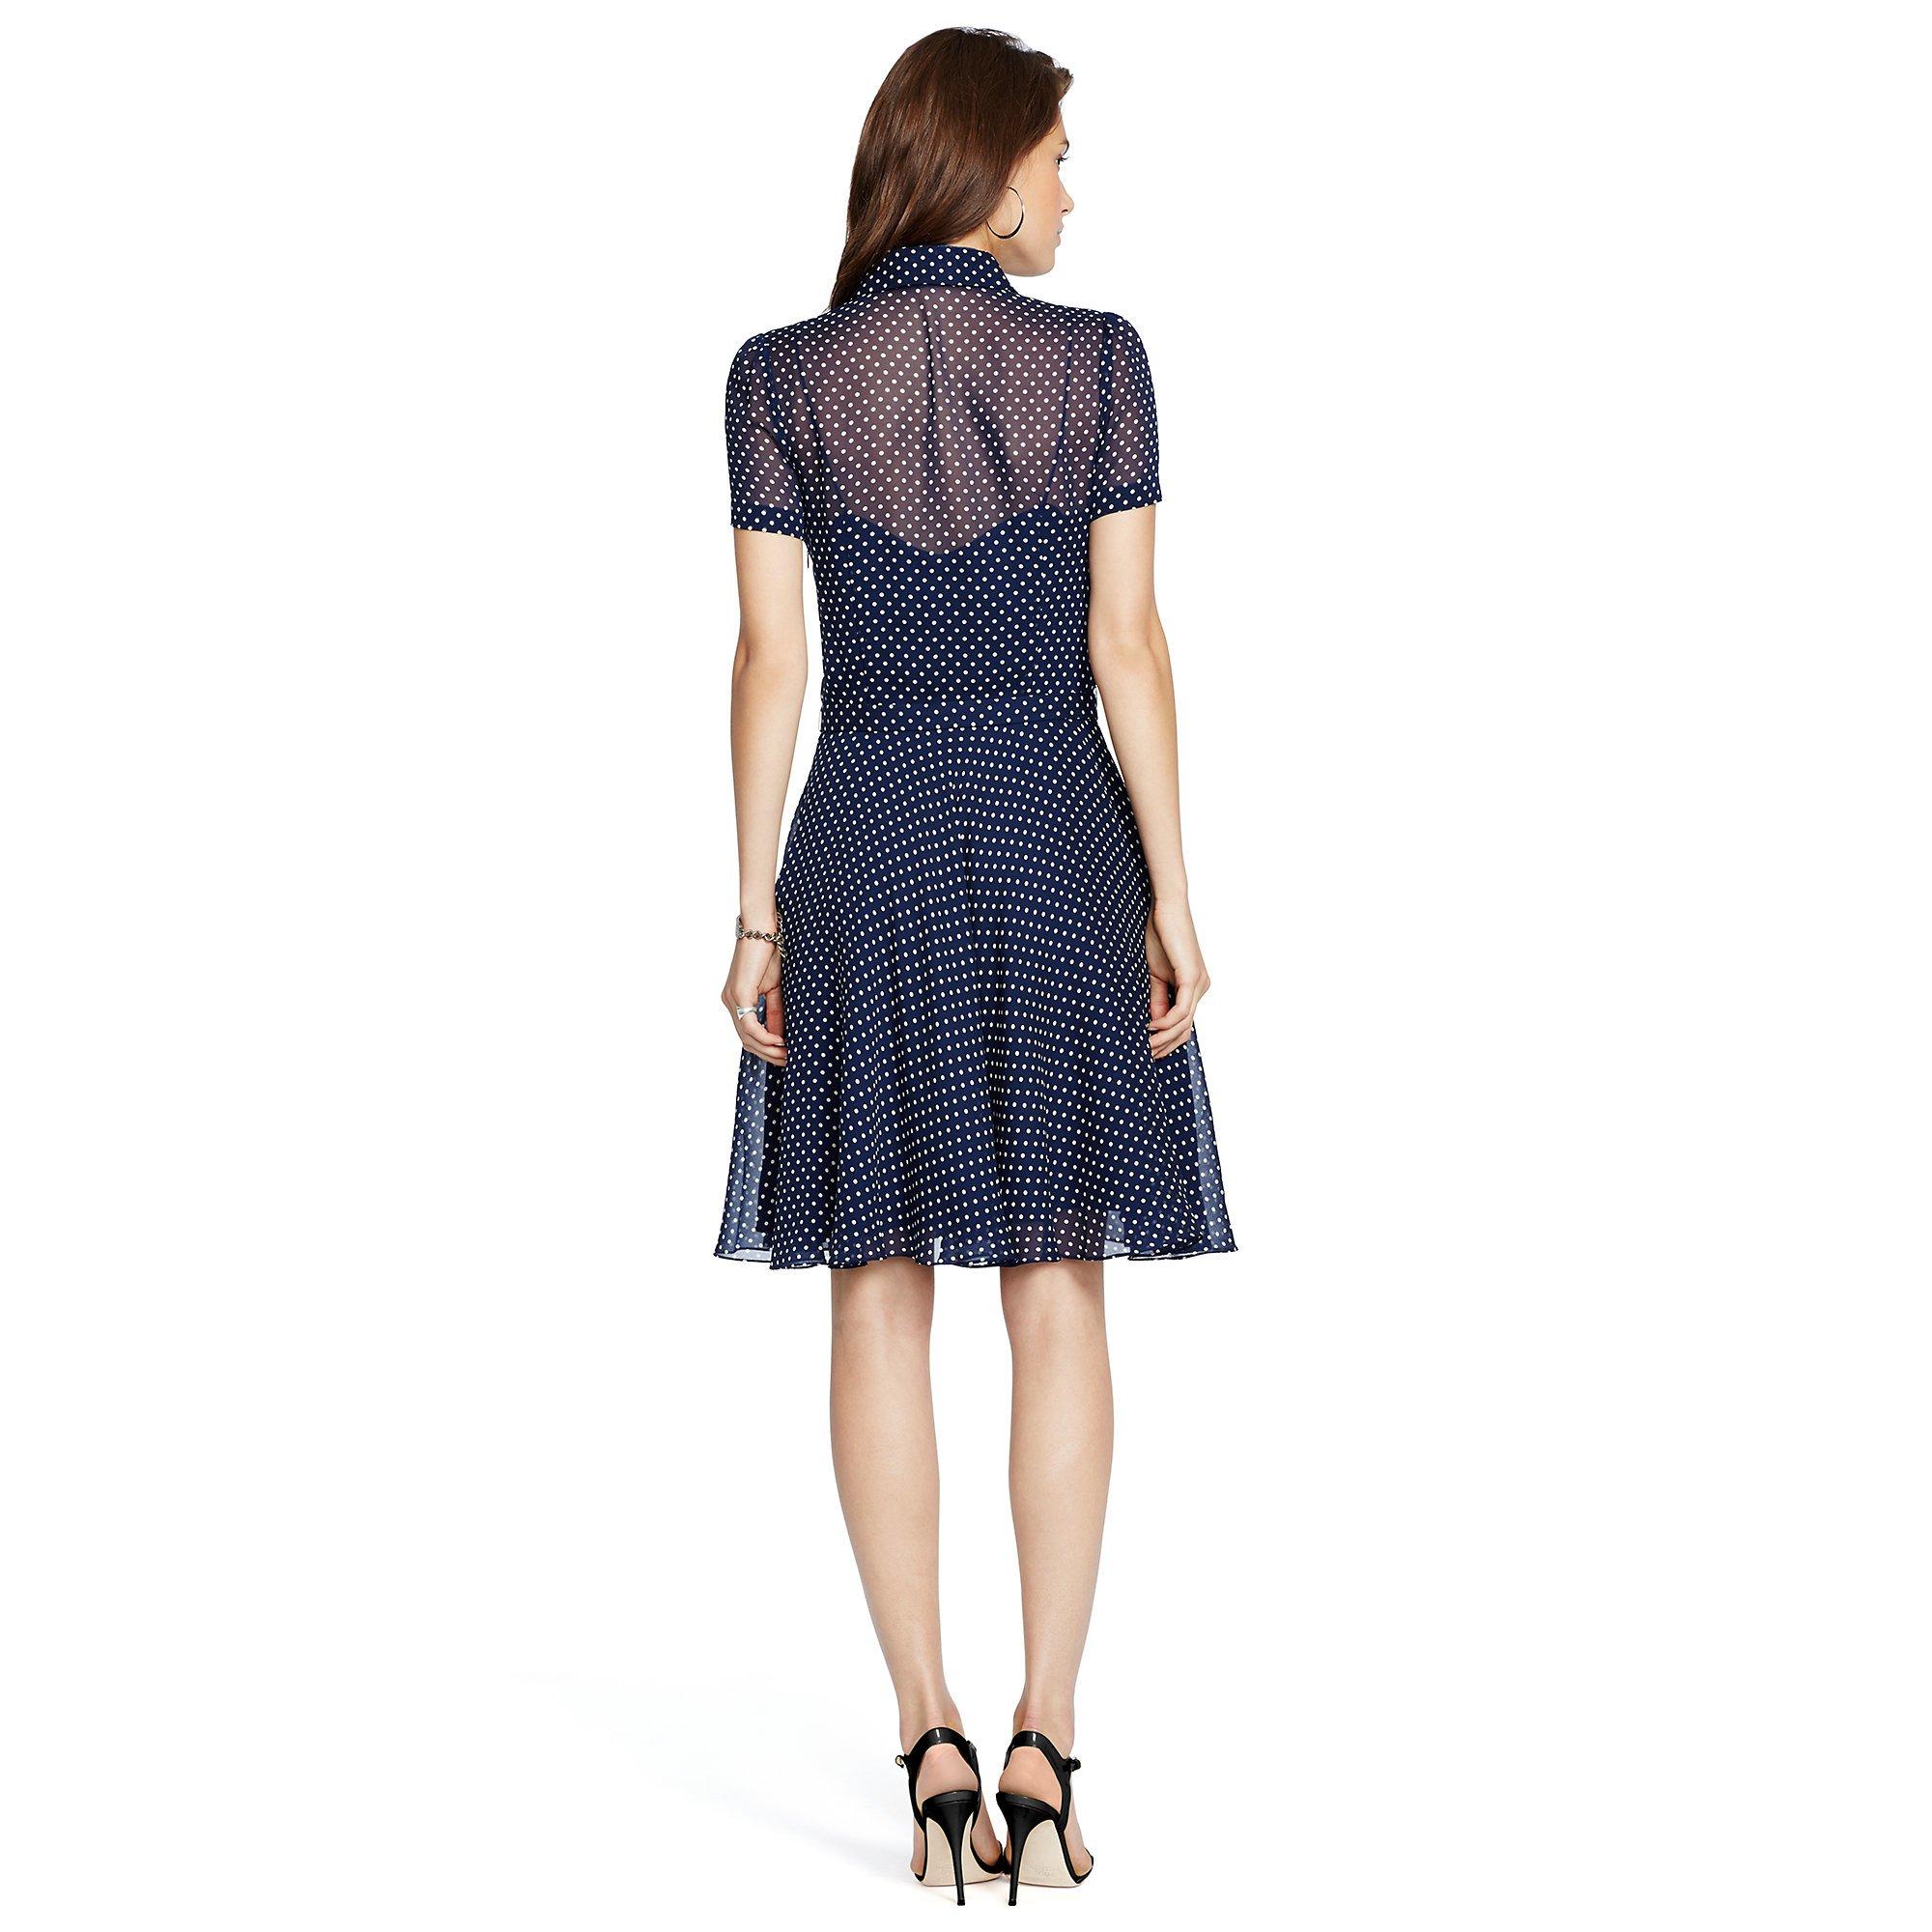 Polo Ralph Lauren Polka Dot Silk Georgette Dress In Polka